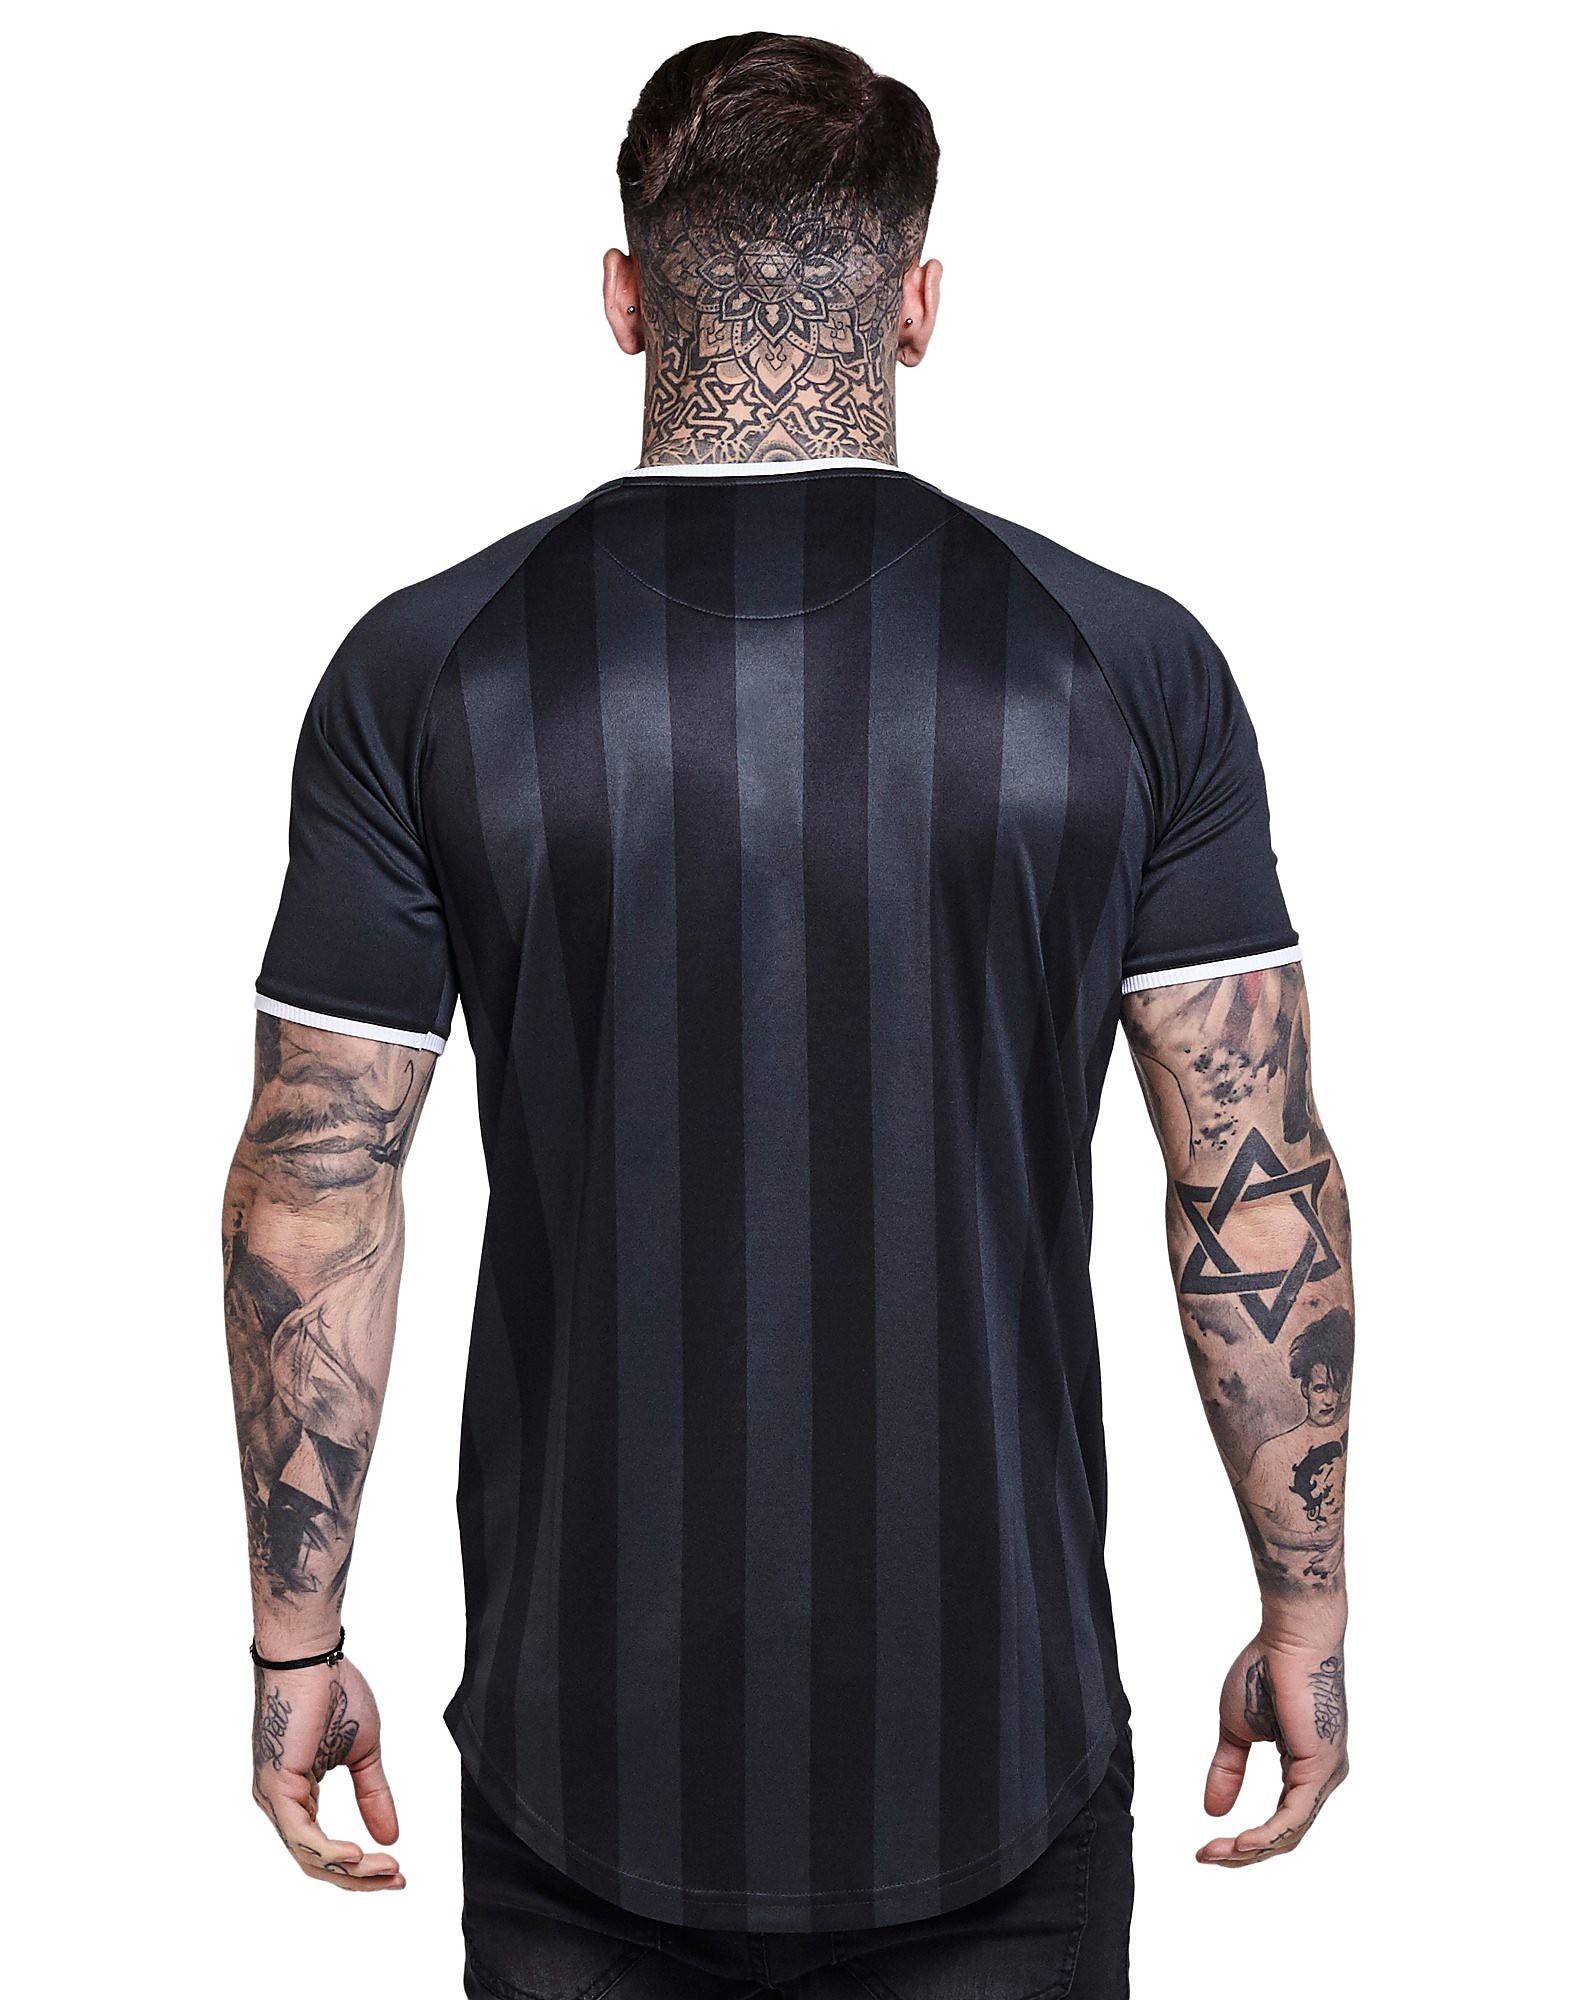 SikSilk T-shirt Retro Football Stripe